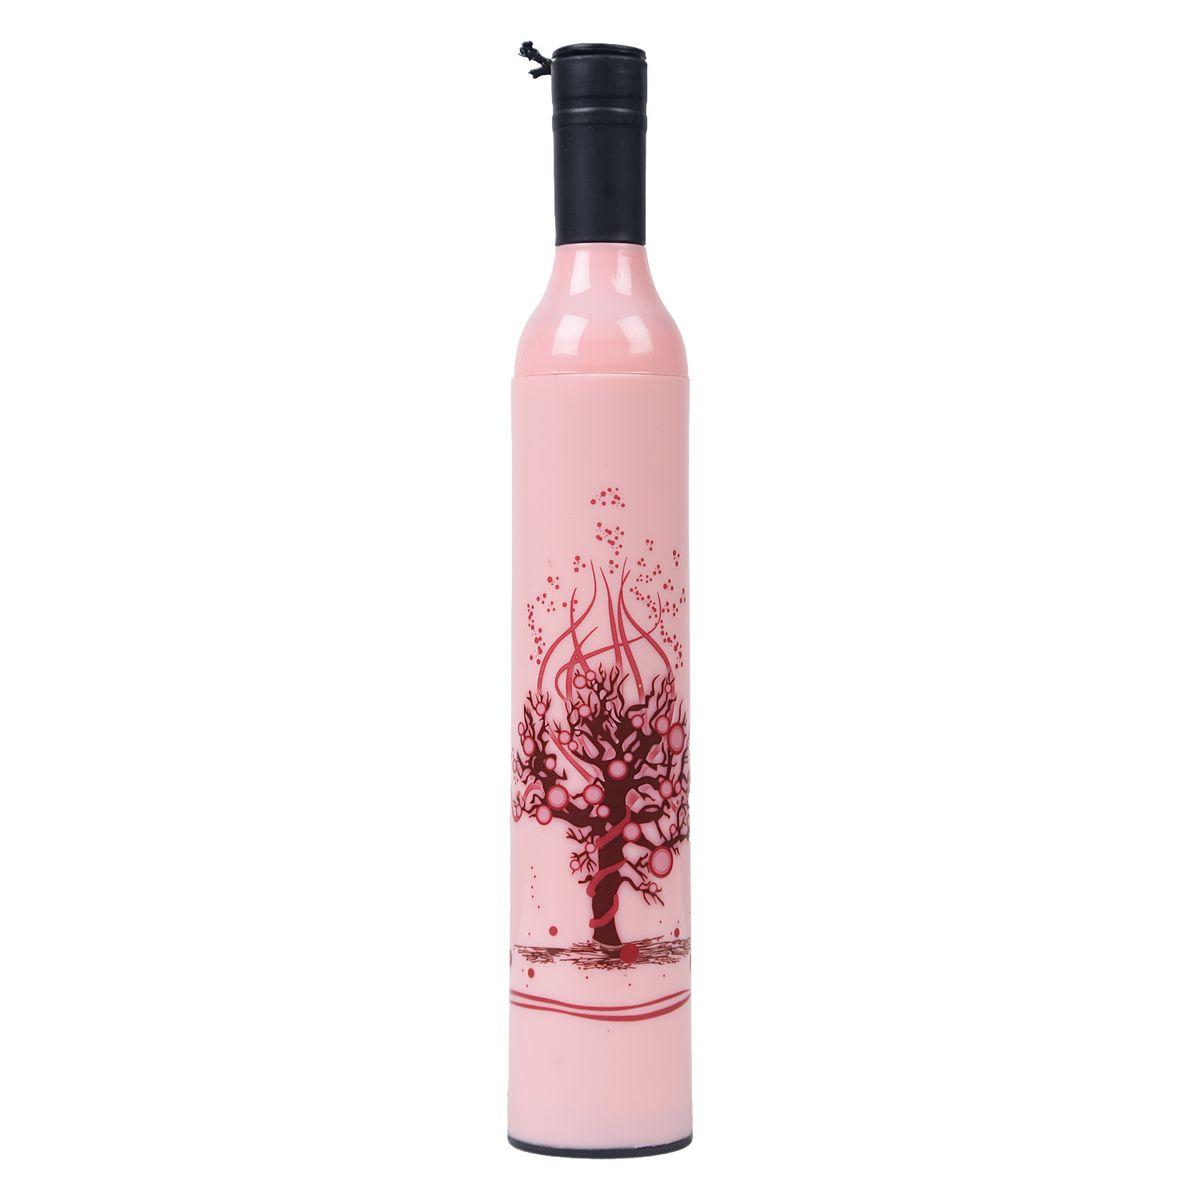 Sultaan Fashionable Wine Bottle Pink Cover Travel Umbrella